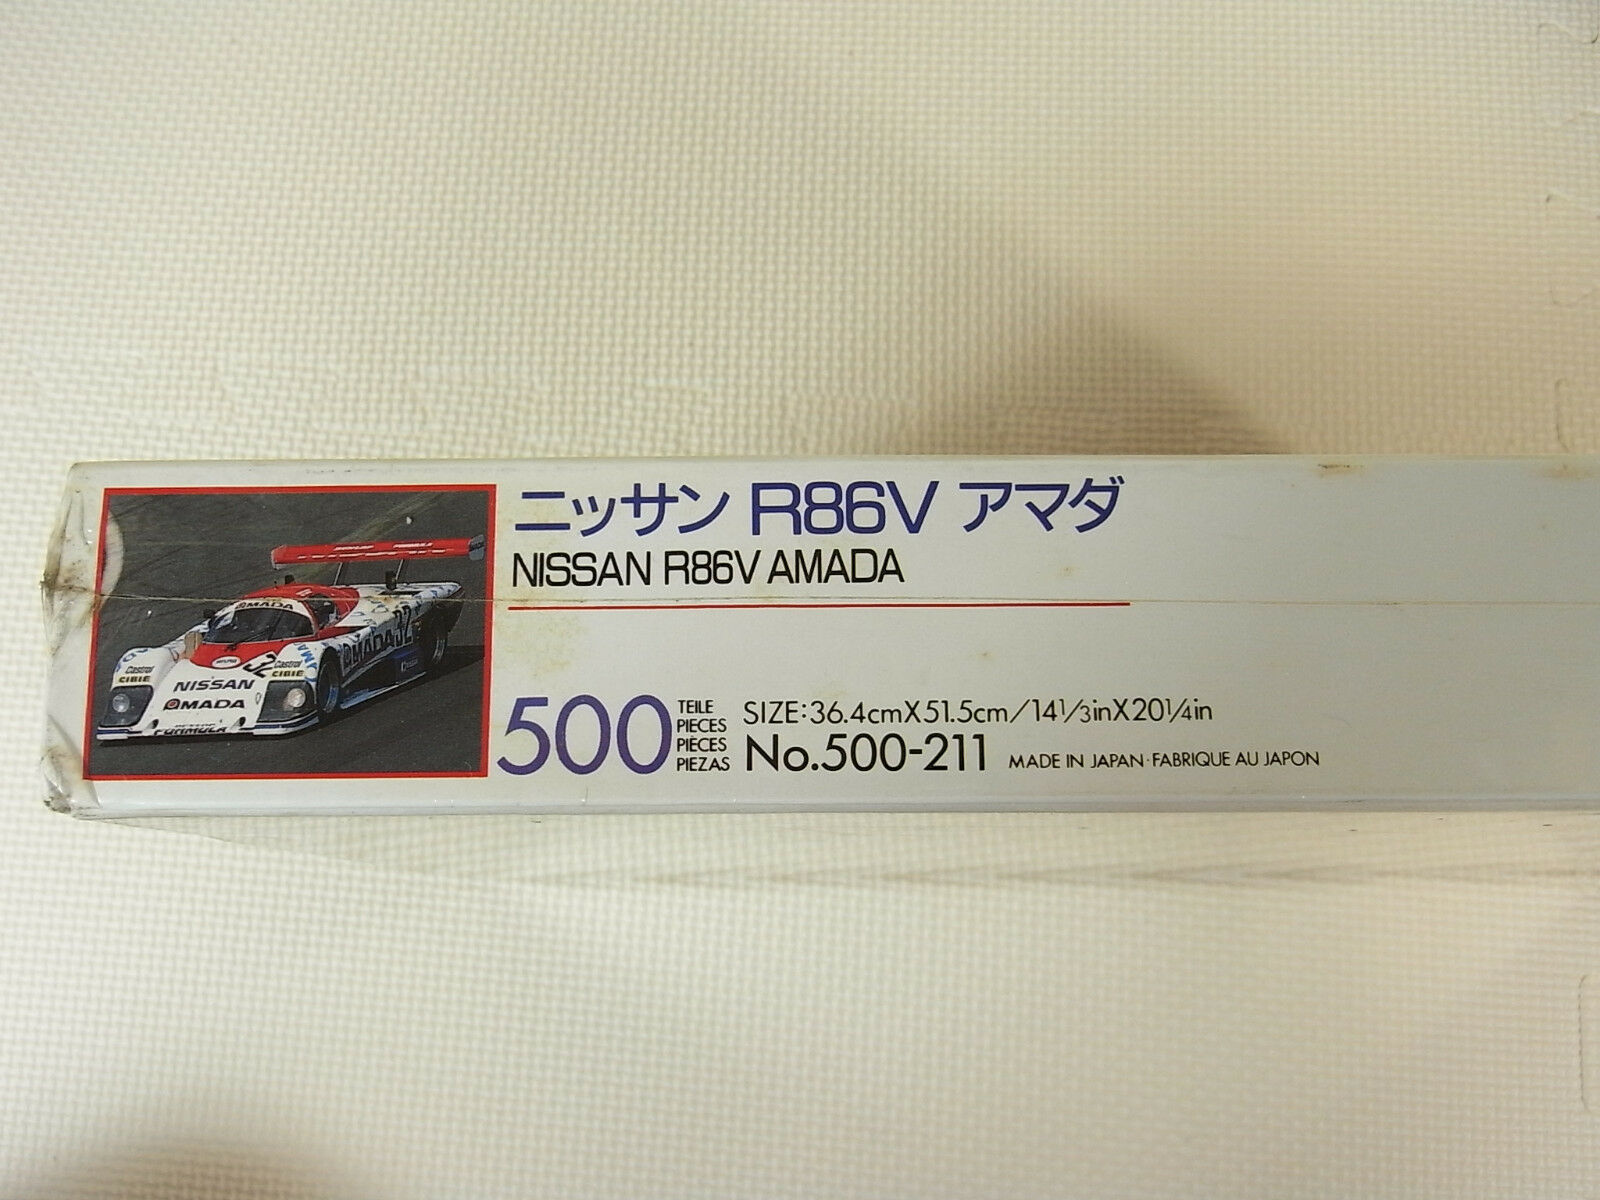 NISSAN R86V 500pcs AMADA  32 1986 Jigsaw Puzzle 500pcs R86V Japan aac520